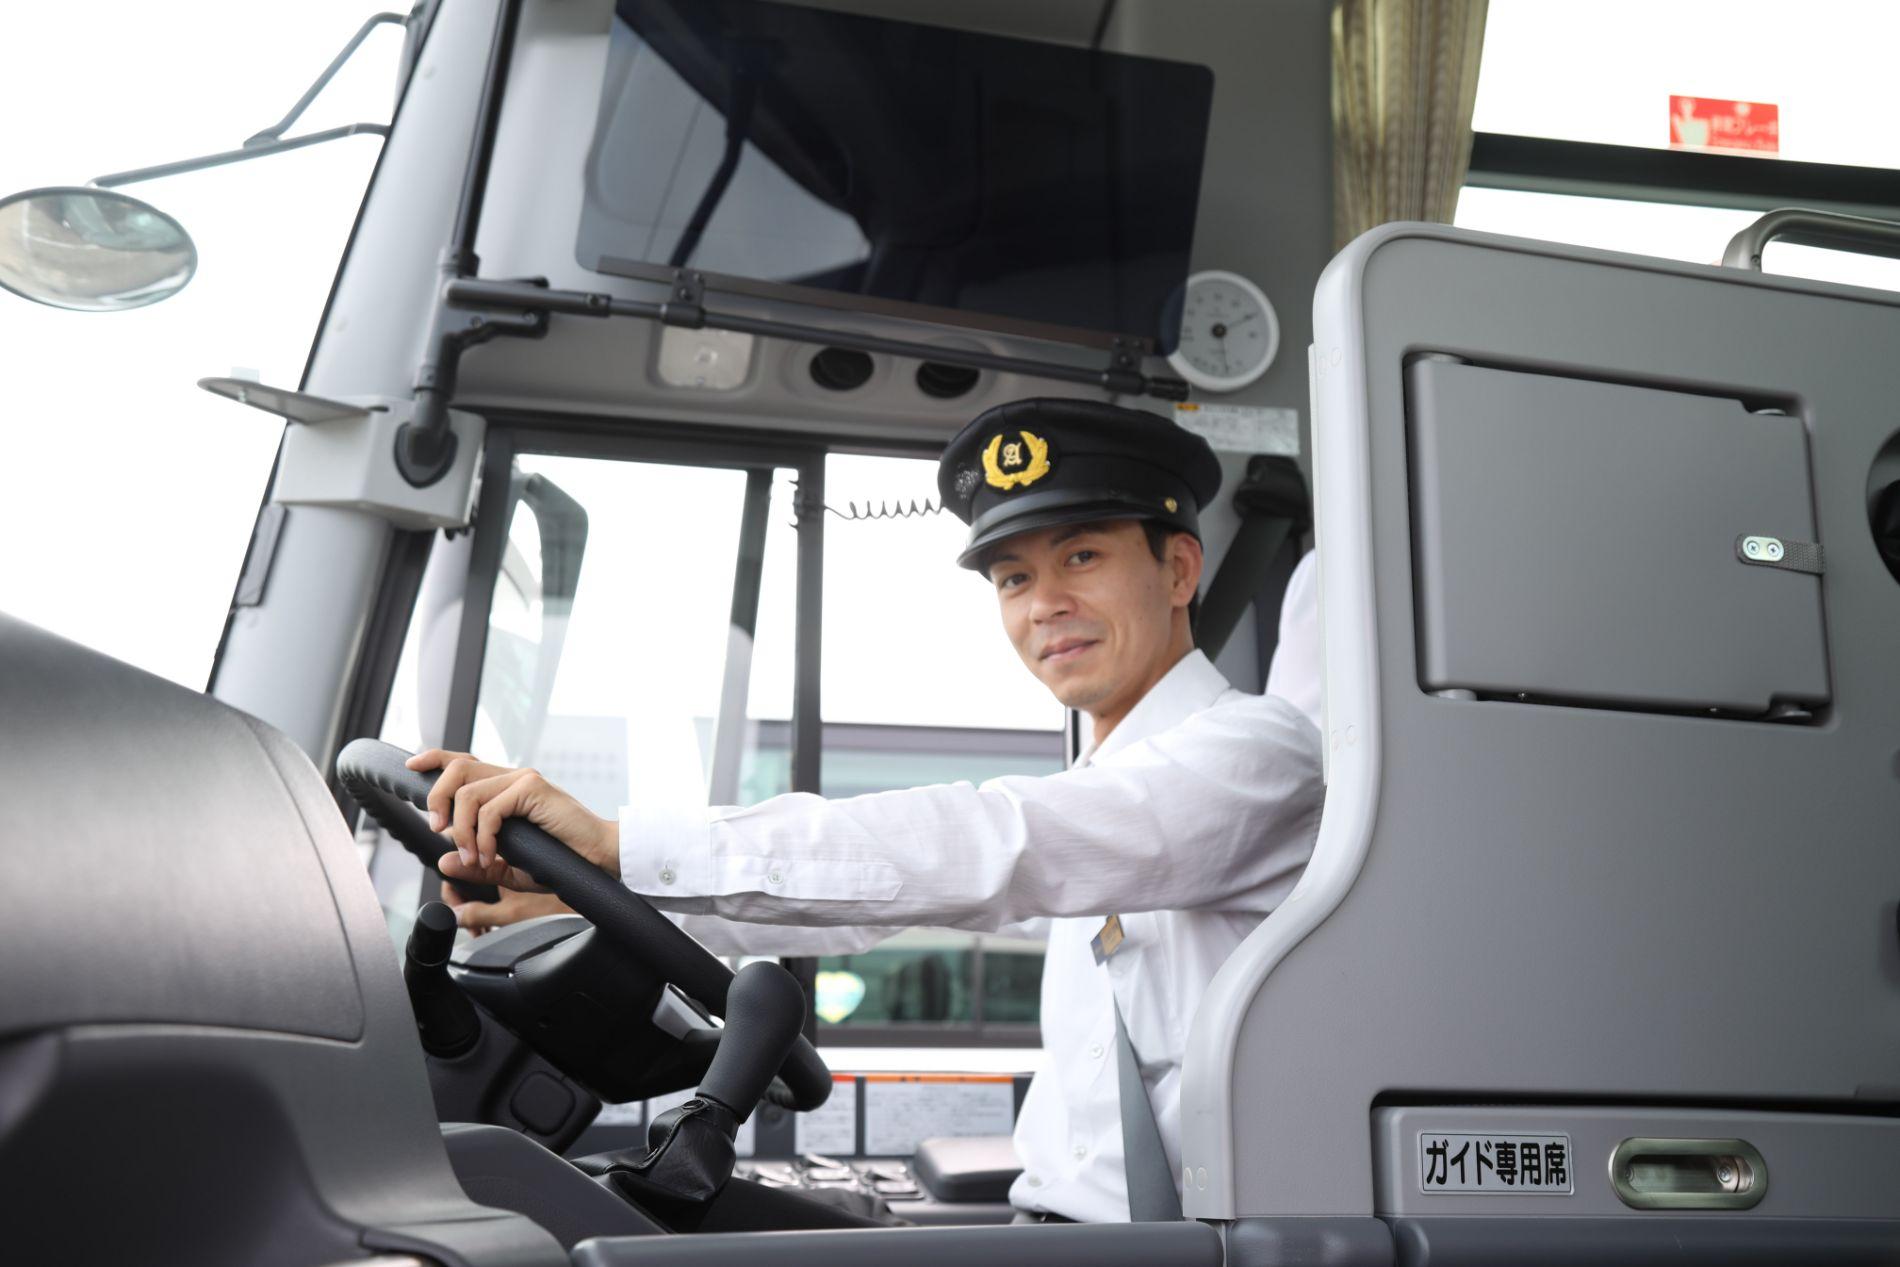 バス運転手募集